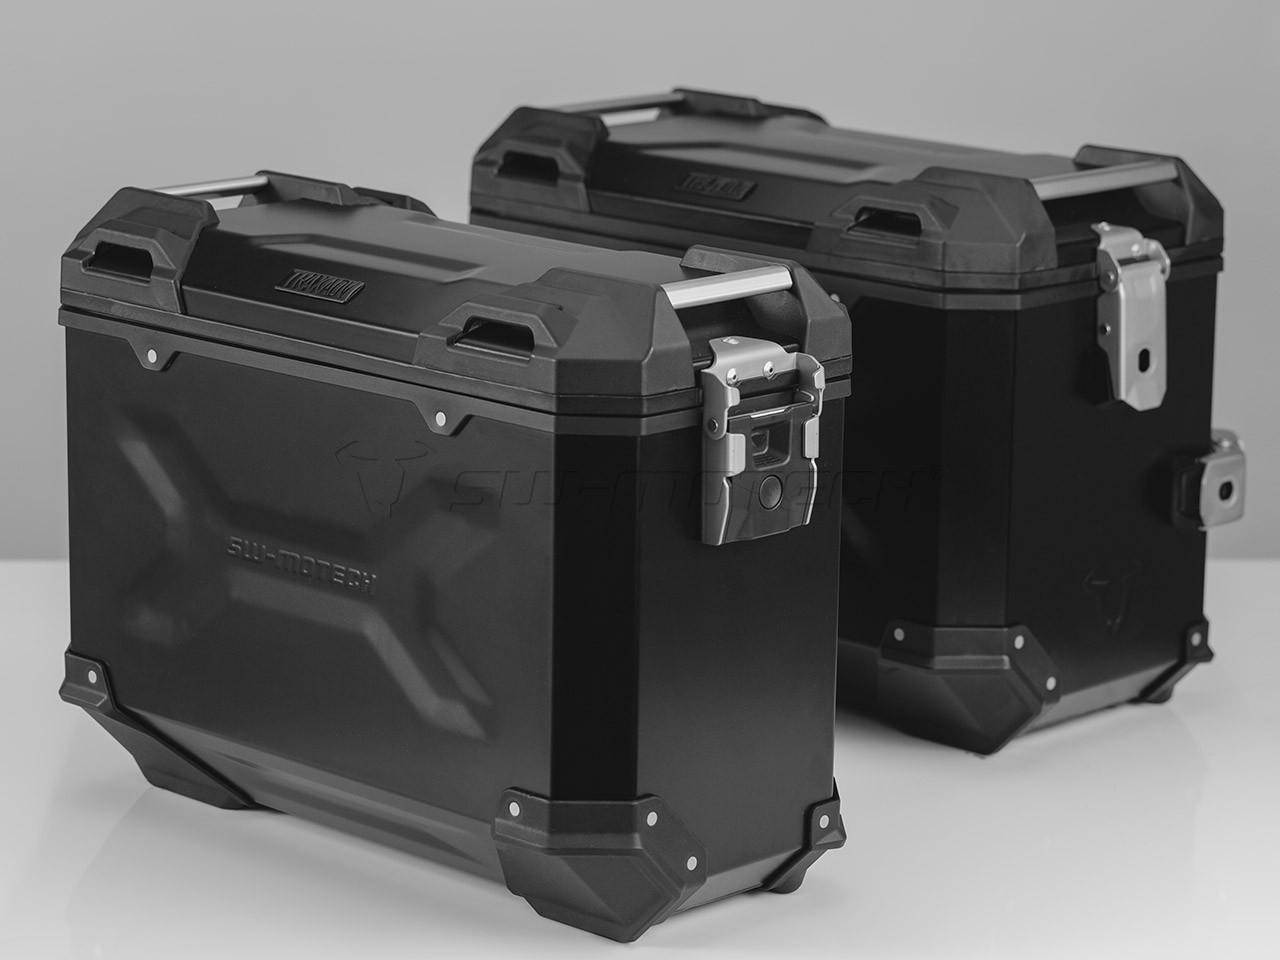 Triumph Tiger 1050 (06-12) - sada bočních kufrů TRAX Adventure 4